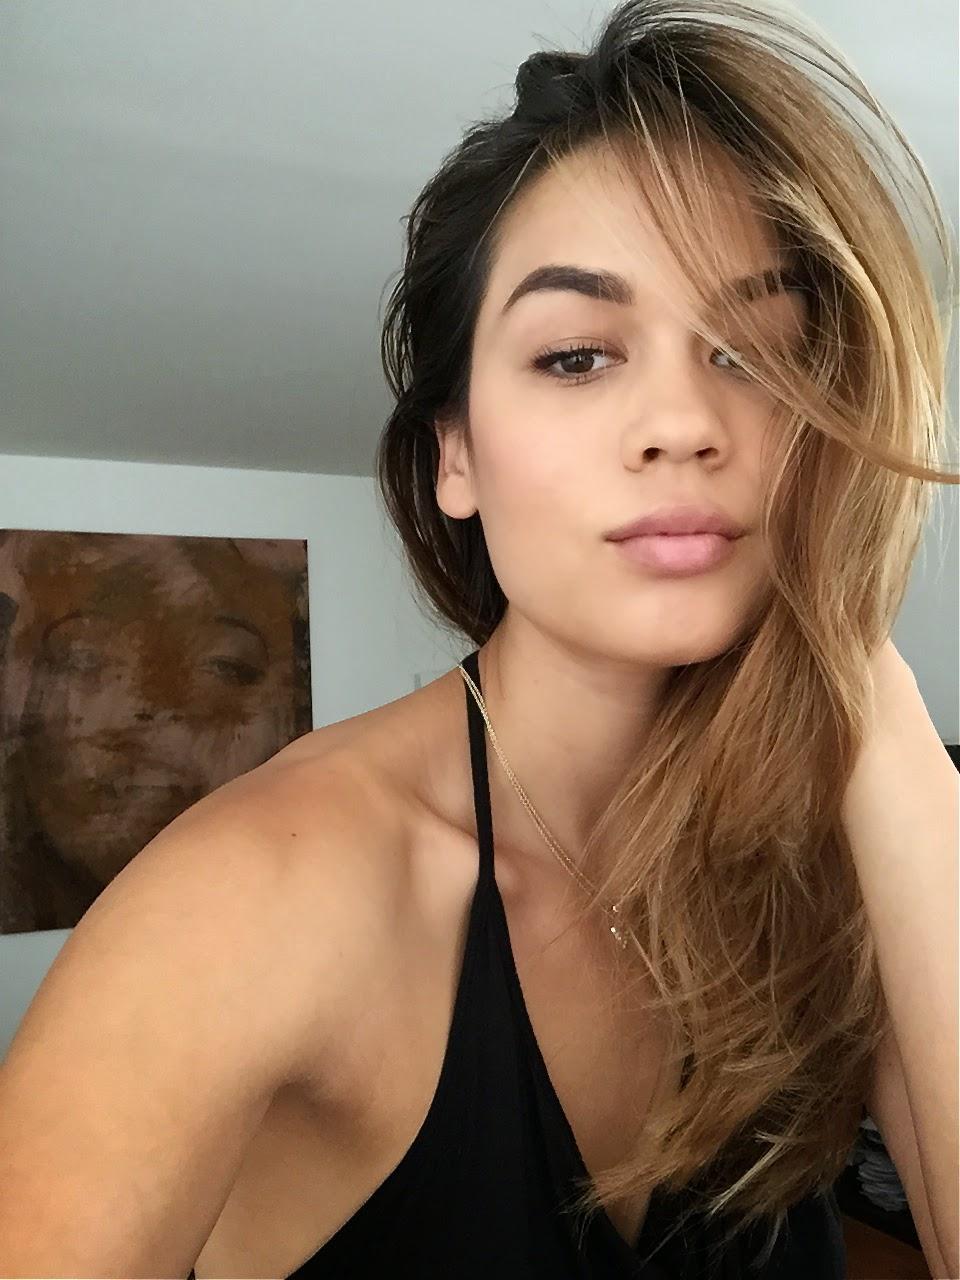 Chloe Delaure naked 89